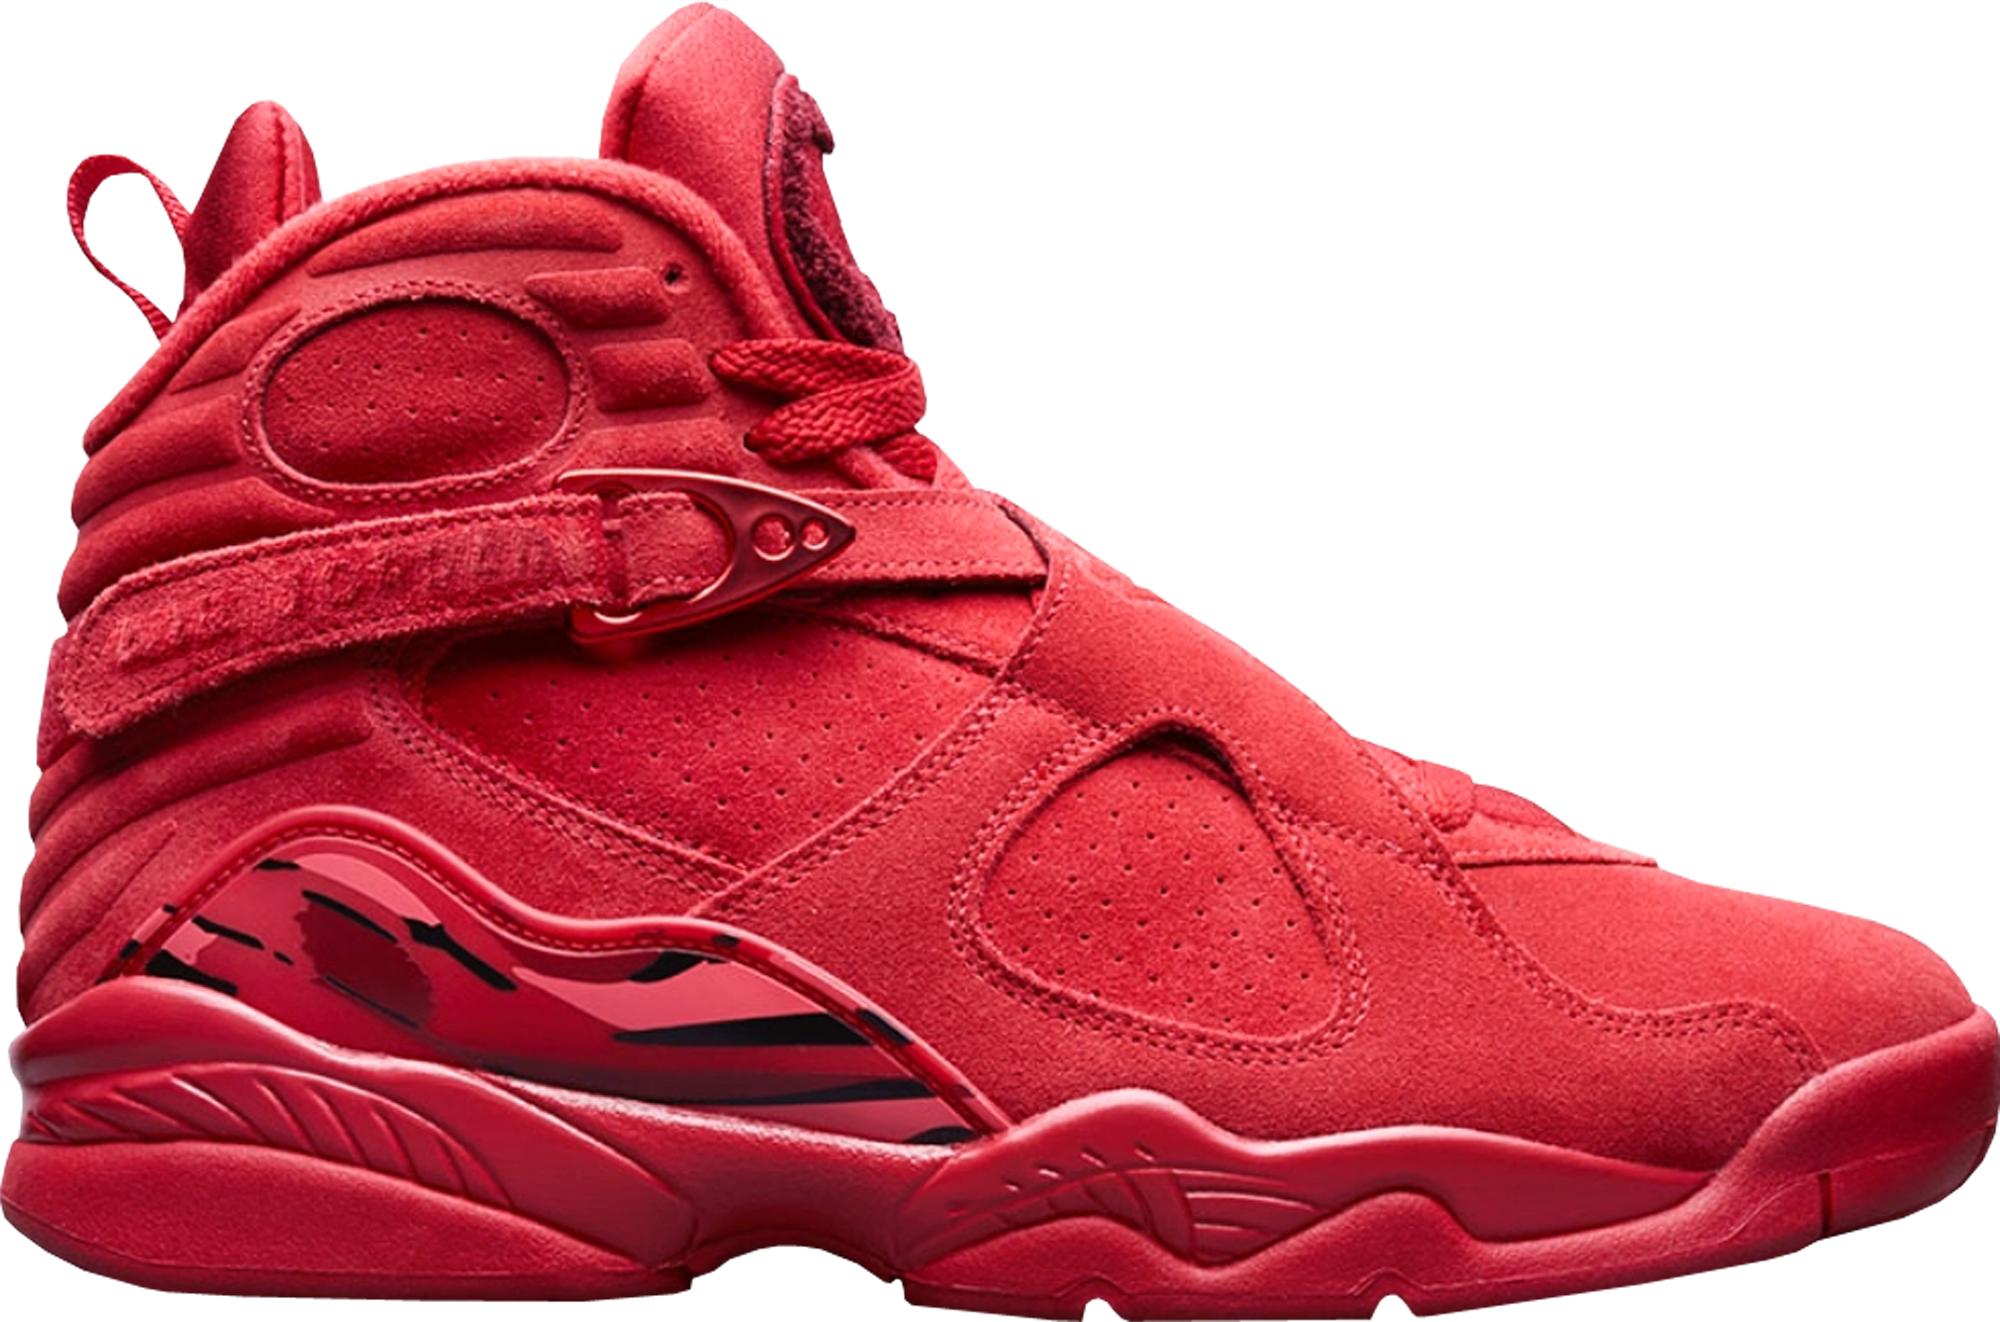 Jordan 8 Retro Valentine's Day 2018 (W)